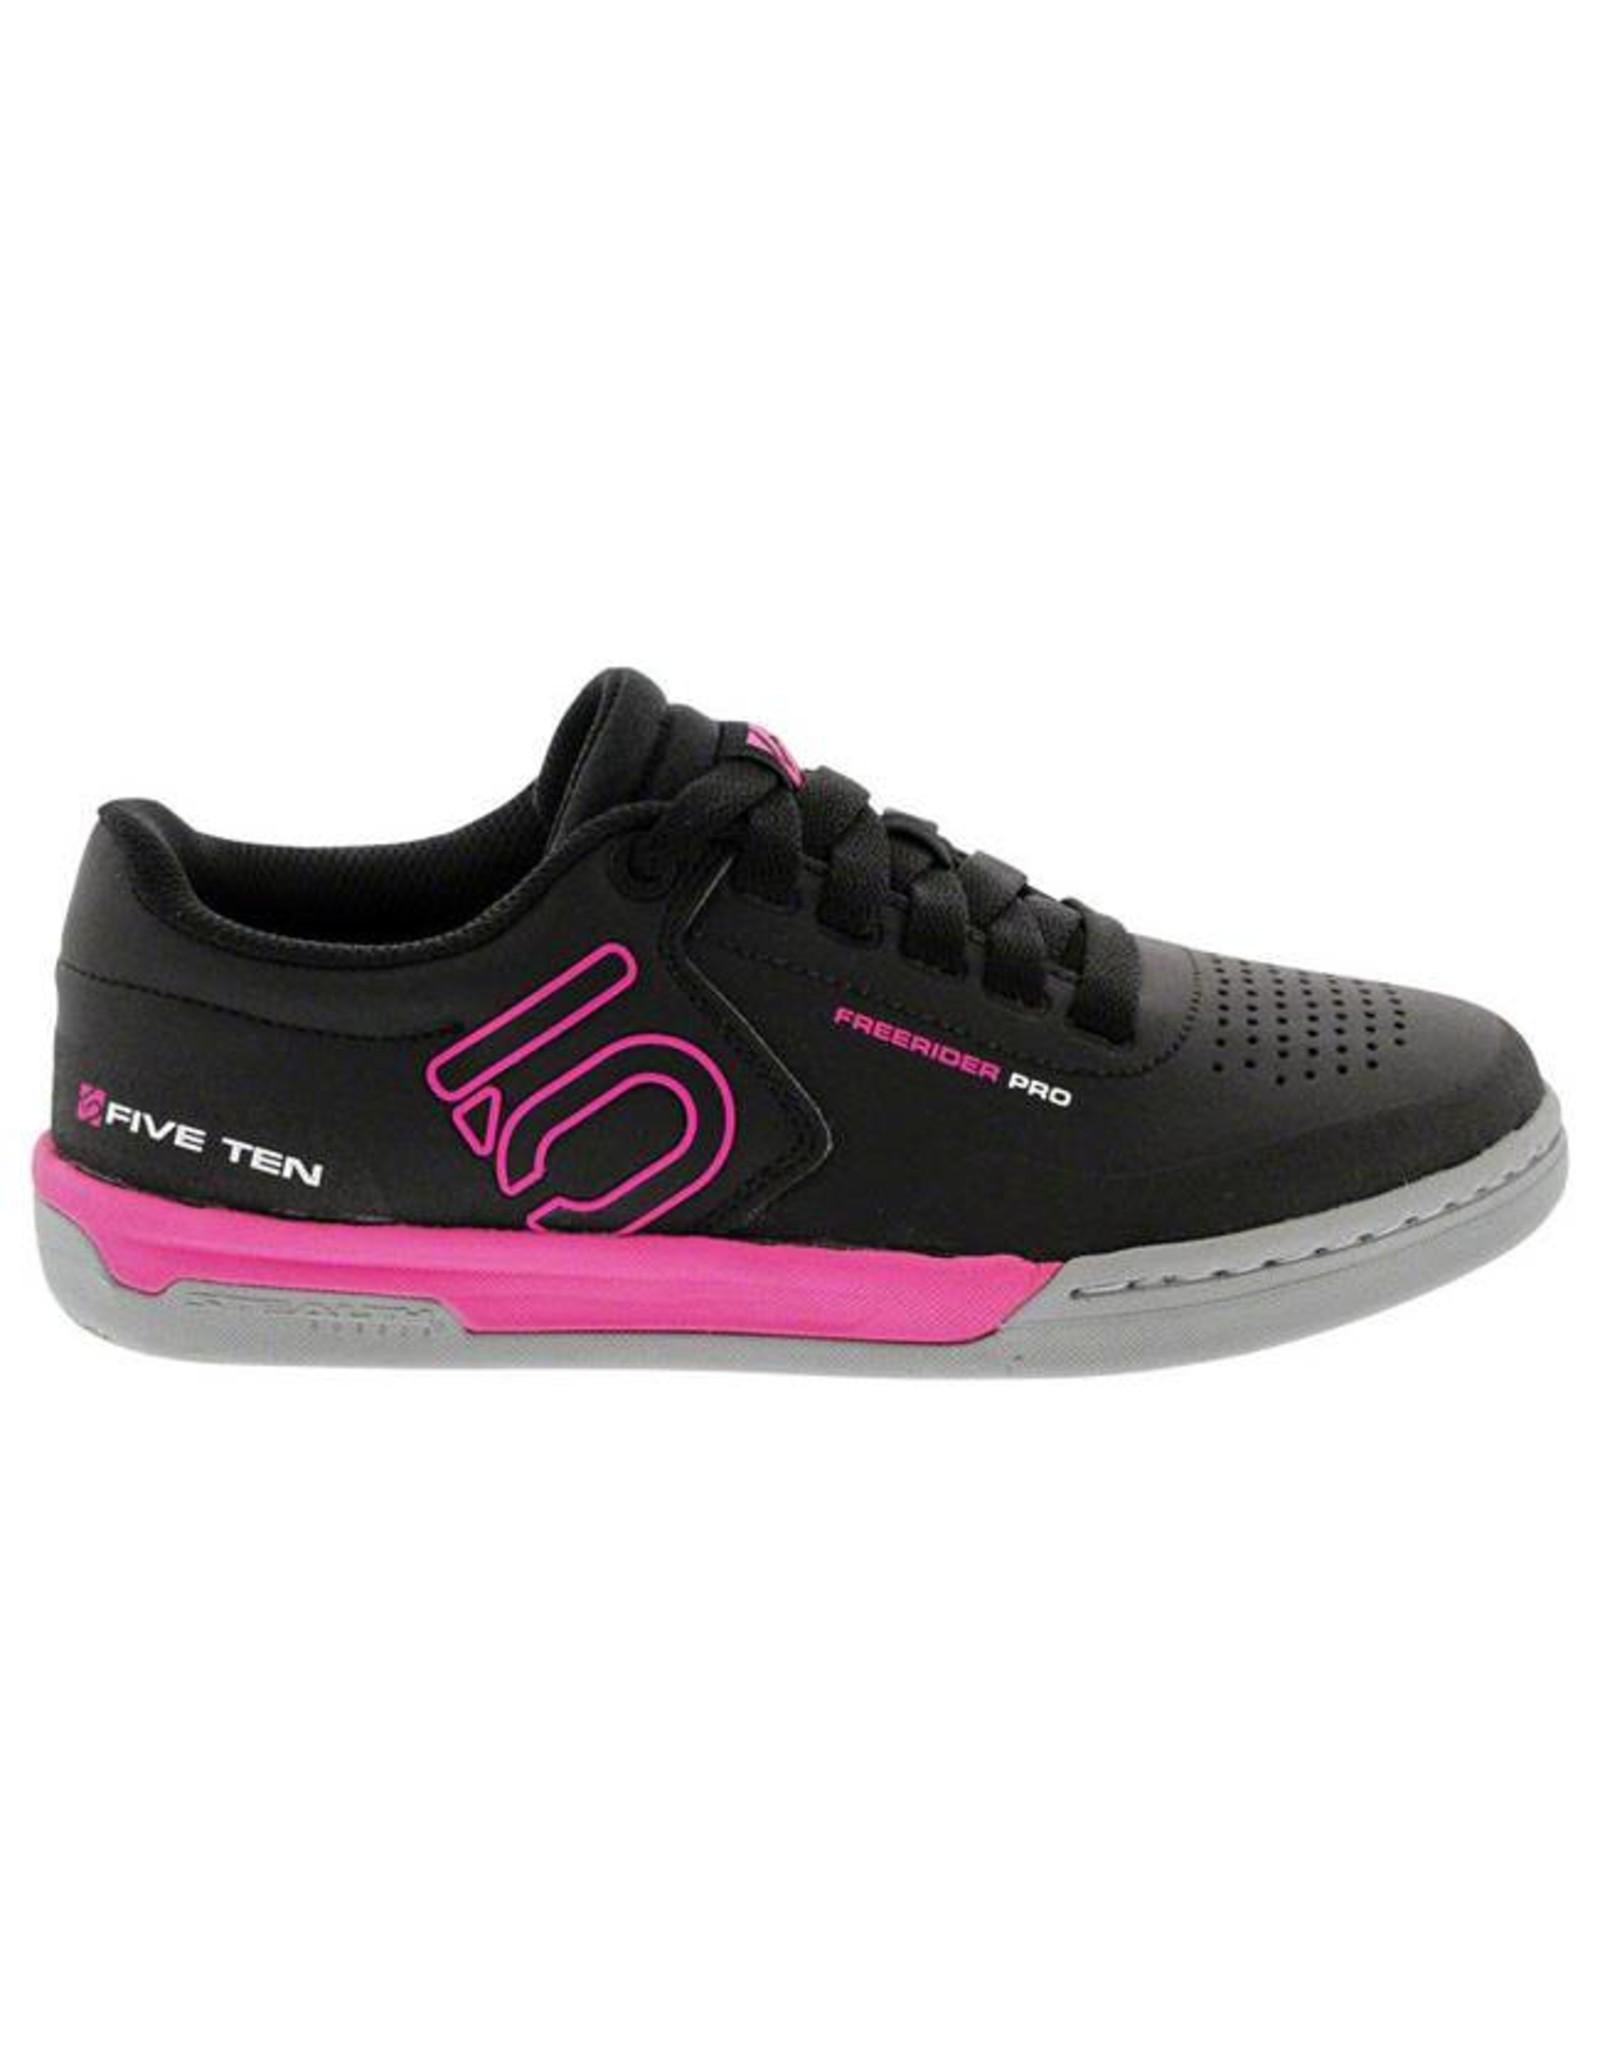 Five Ten Five Ten Freerider Pro Women's Flat Pedal Shoe: Black/Pink 8.5